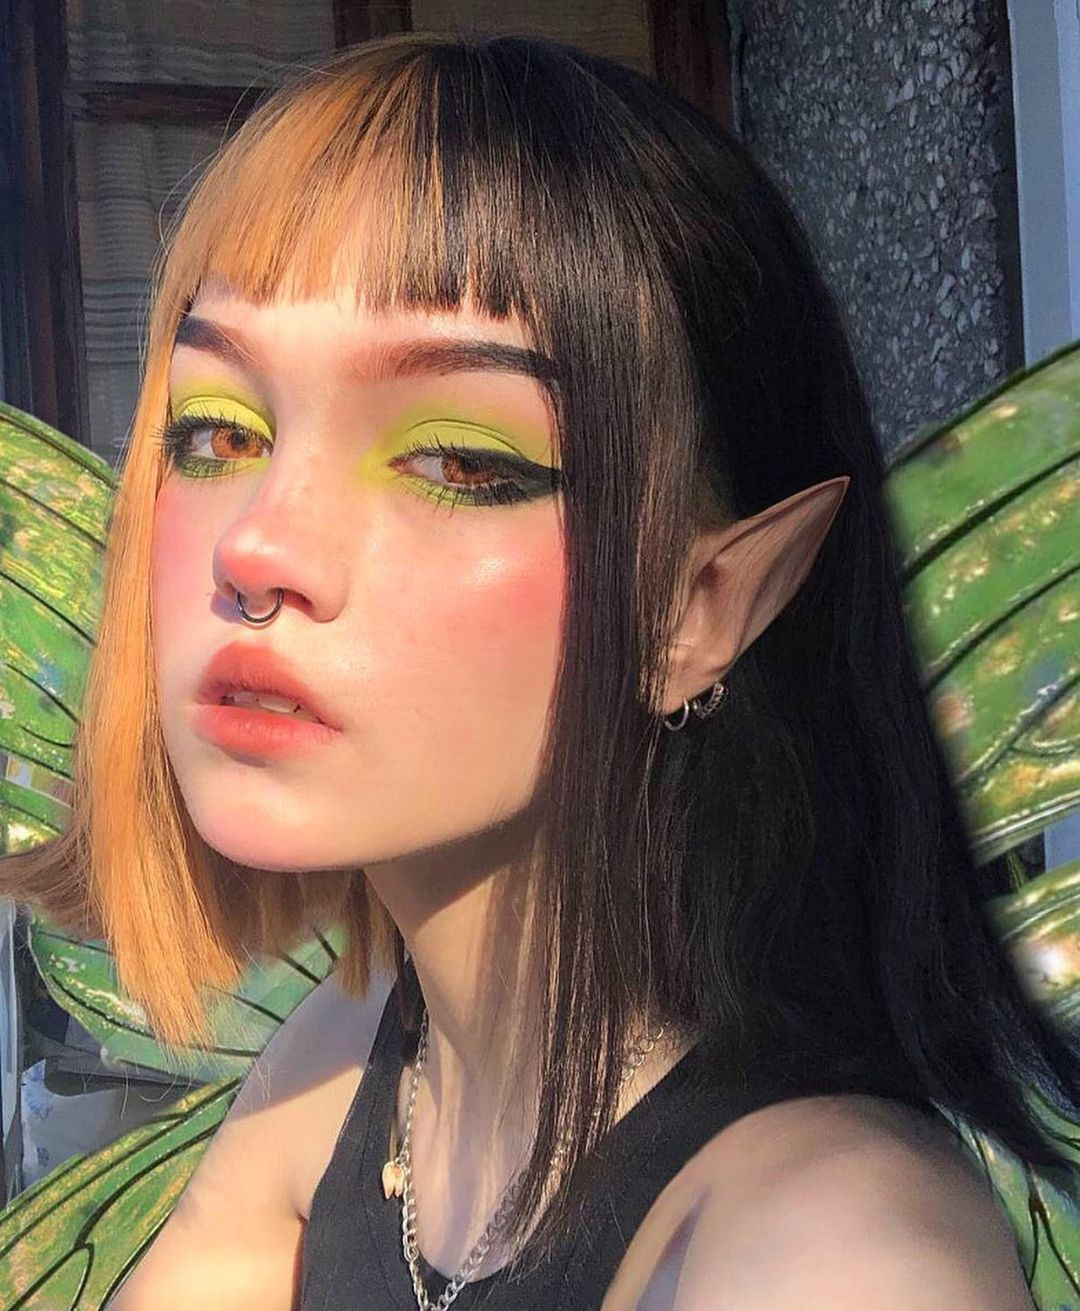 tendencia fairycore aesthetic